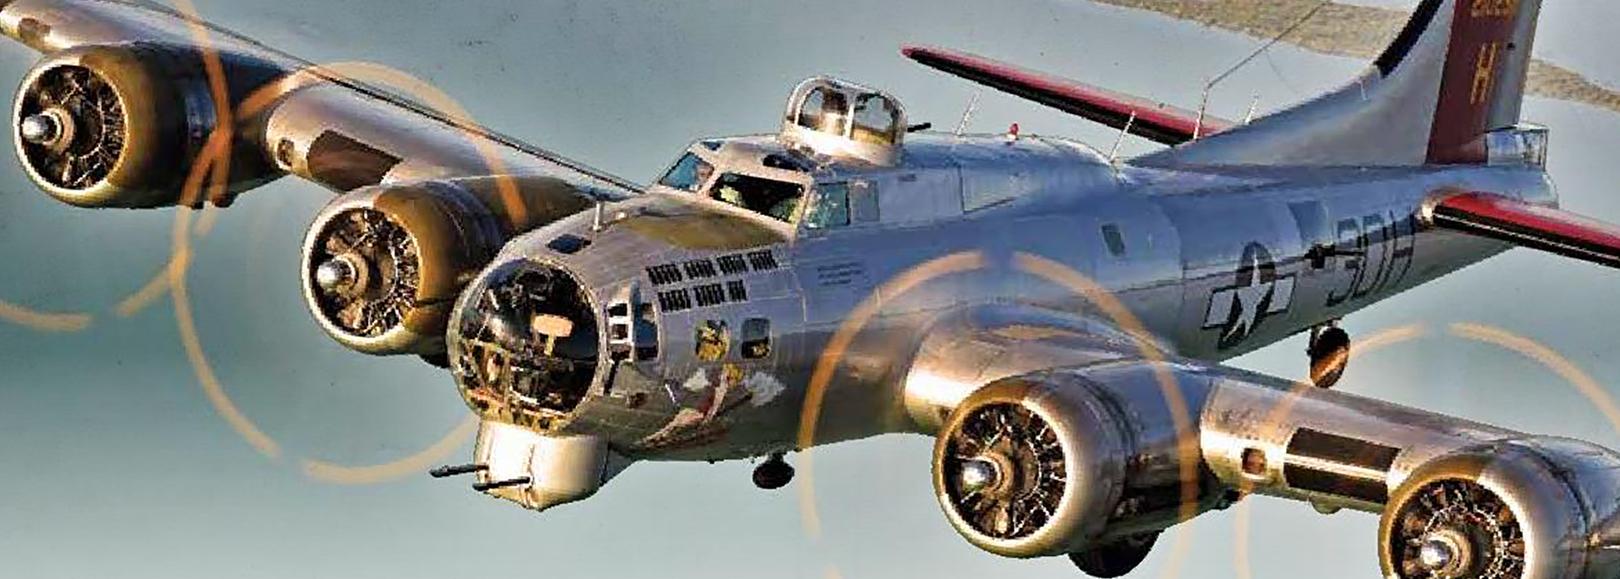 "Lake County, Illinois, CVB - - B-17 ""Aluminum Overcast"" World War II"